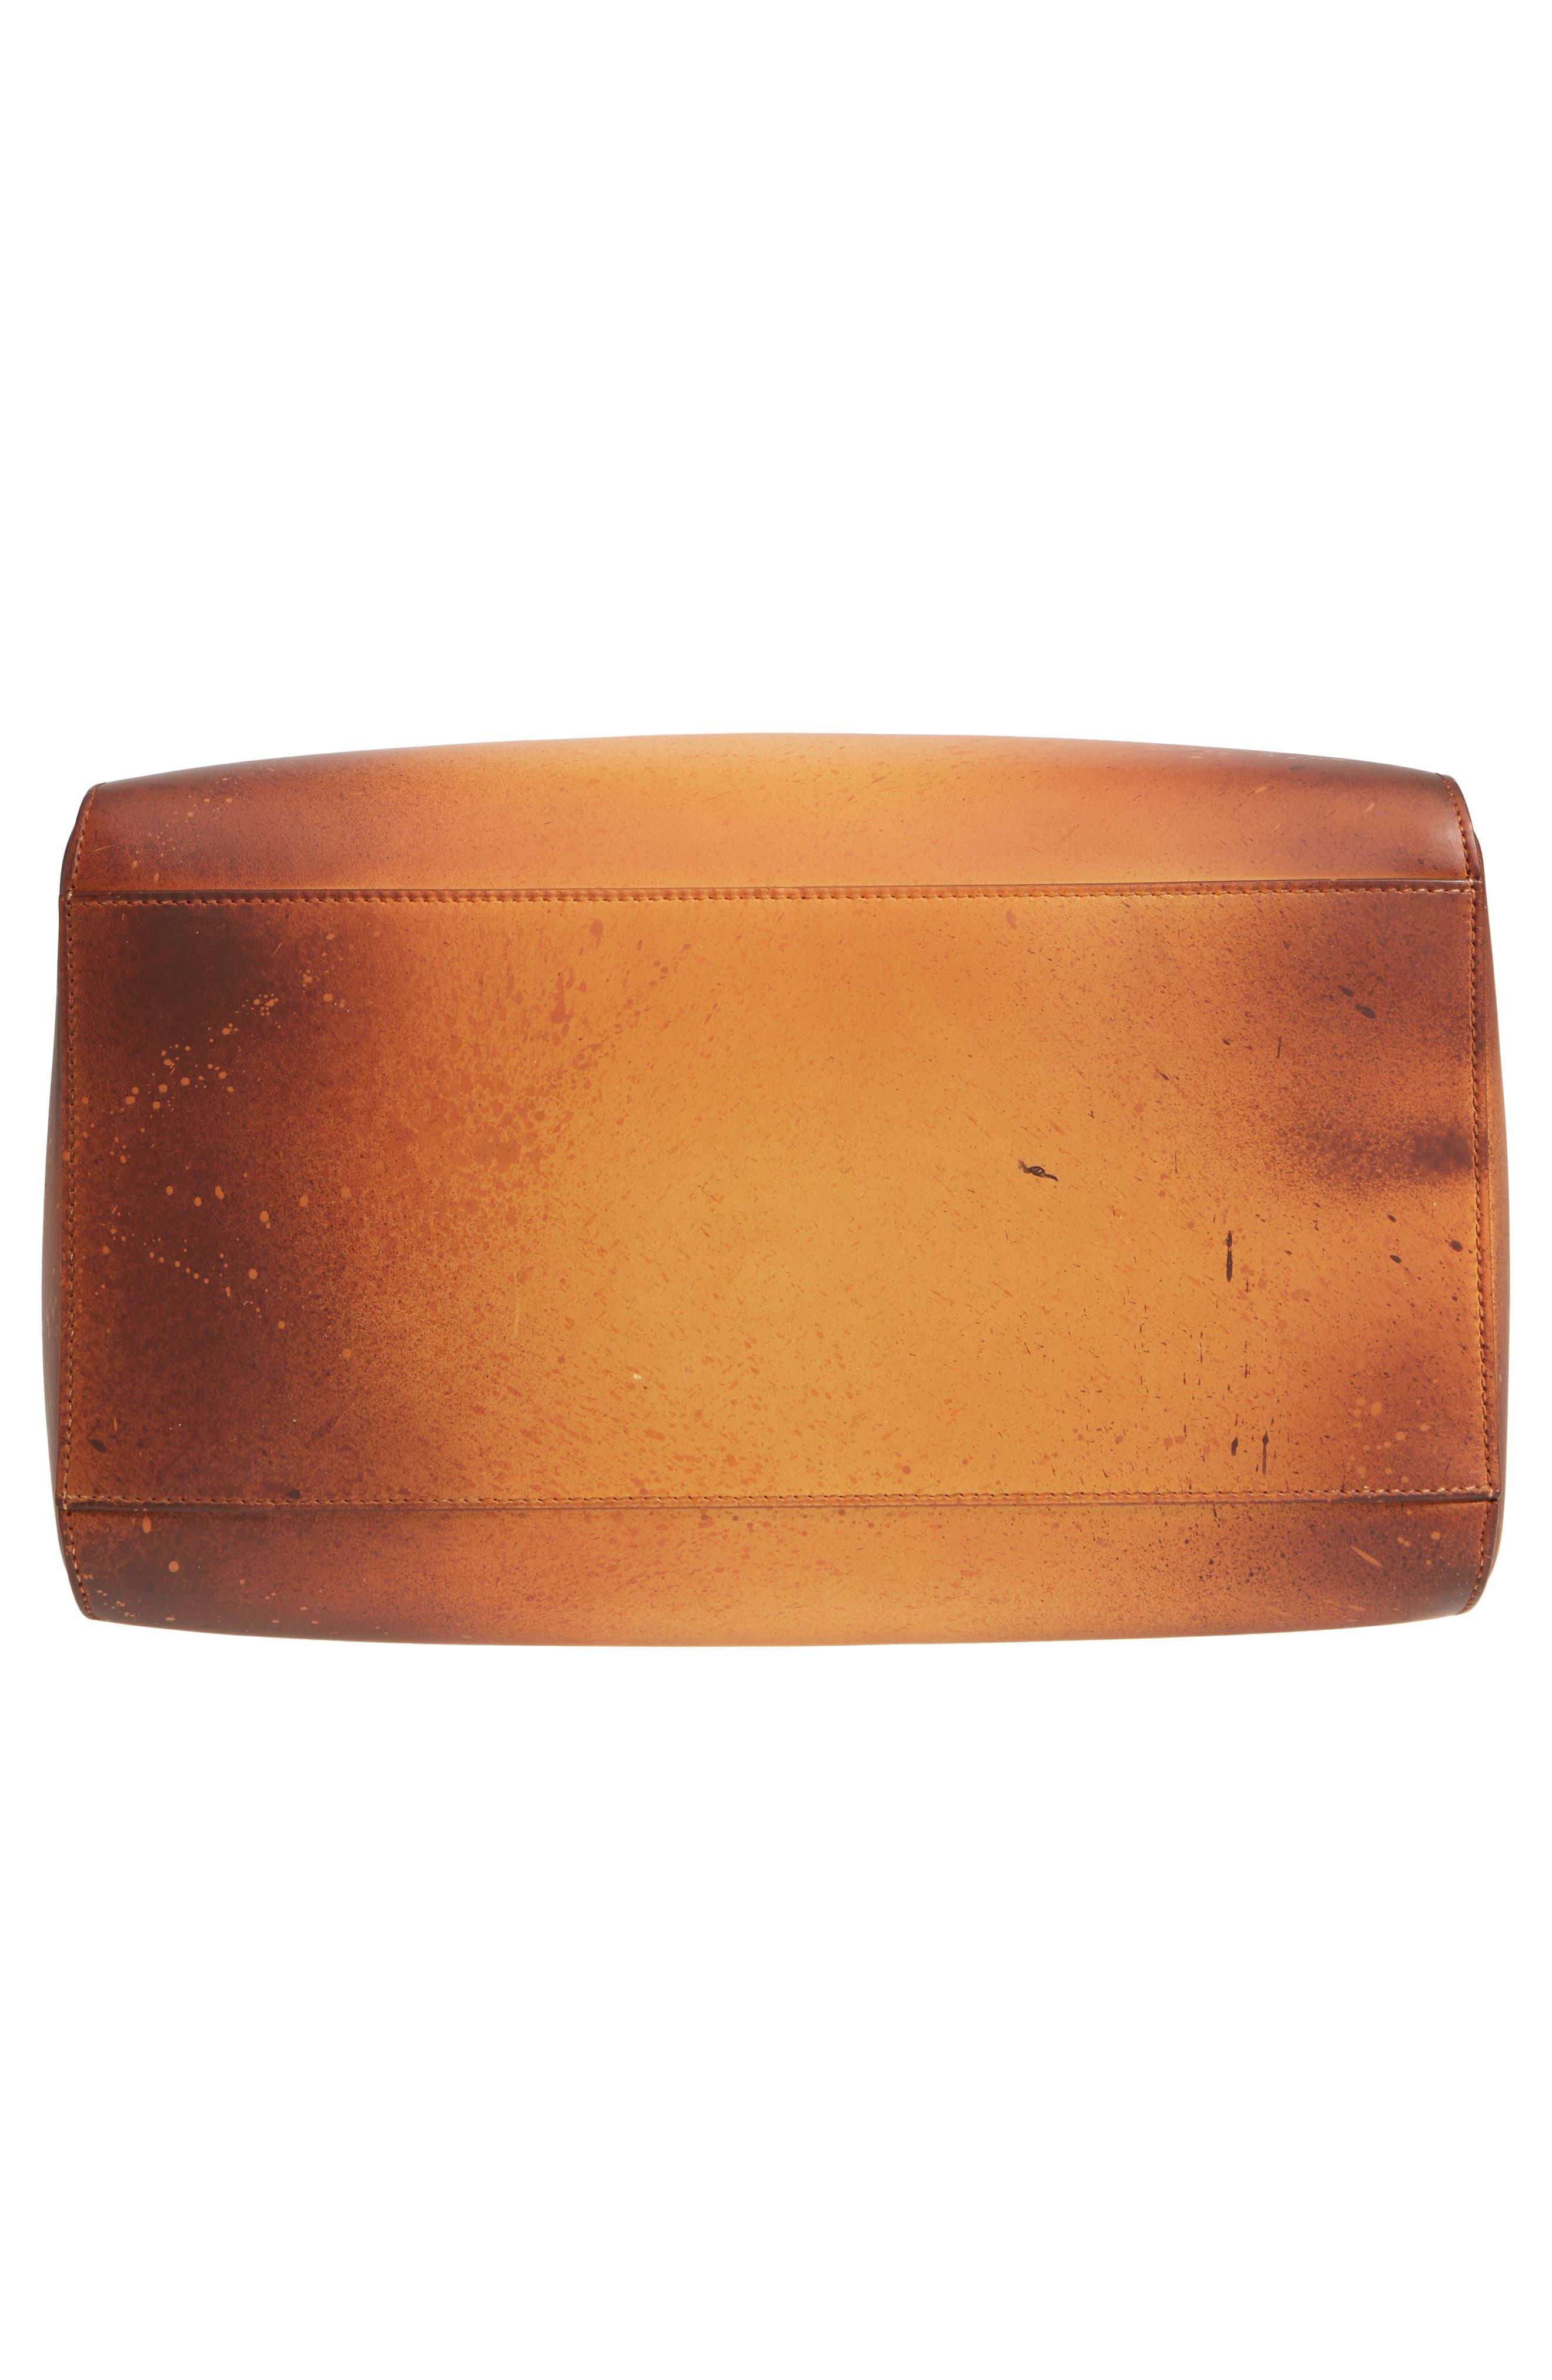 x Andy Warhol Foundation Sandra Brant Calfskin Leather Bucket Bag,                             Alternate thumbnail 6, color,                             AMBER/ BLACK